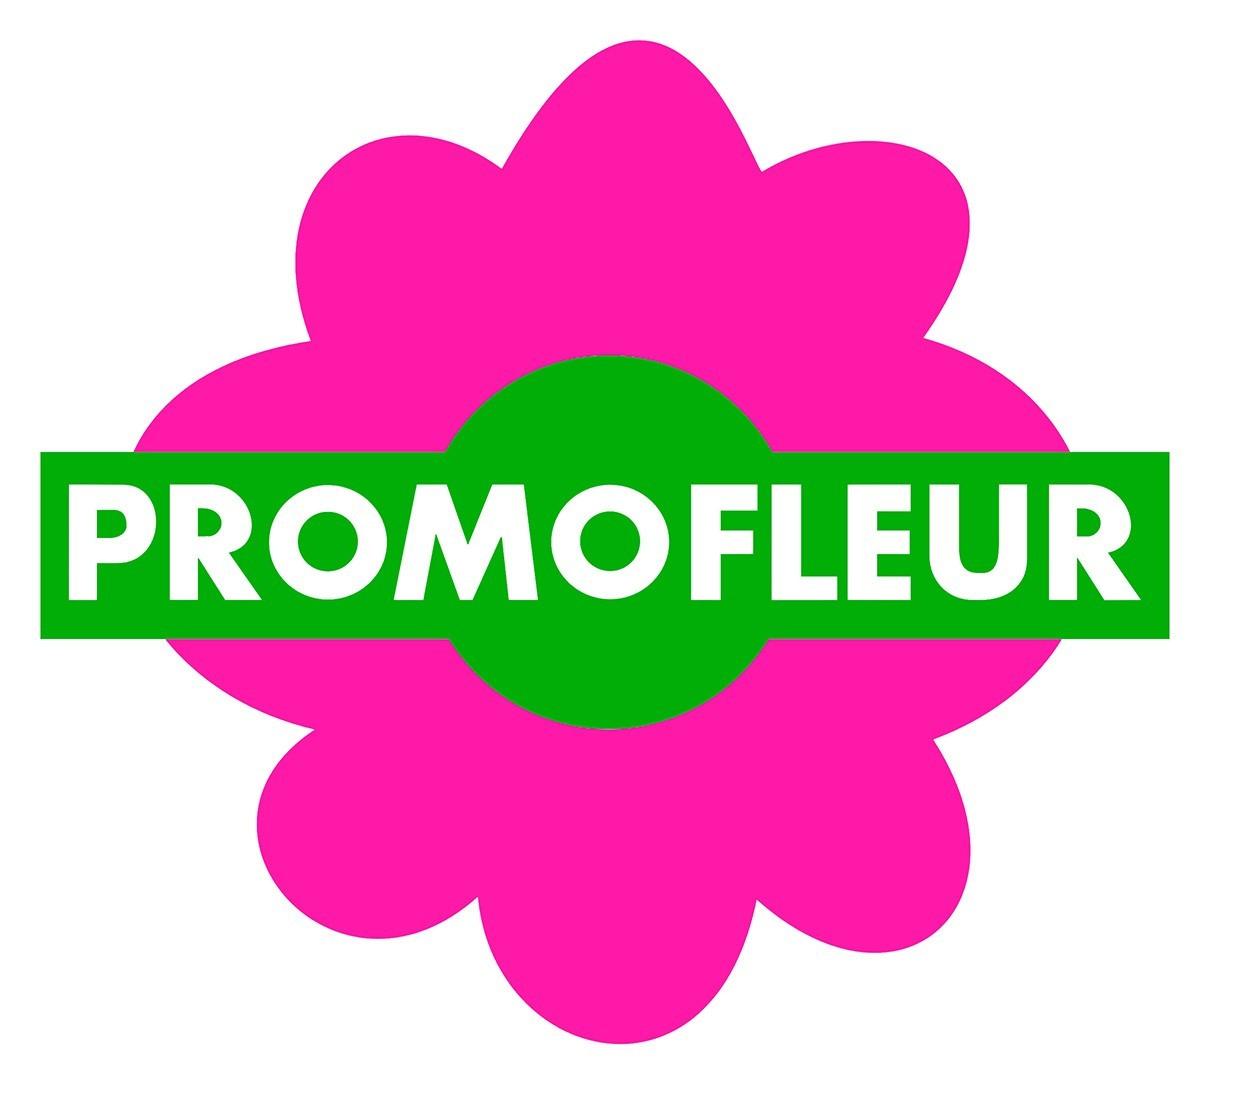 Promofleur